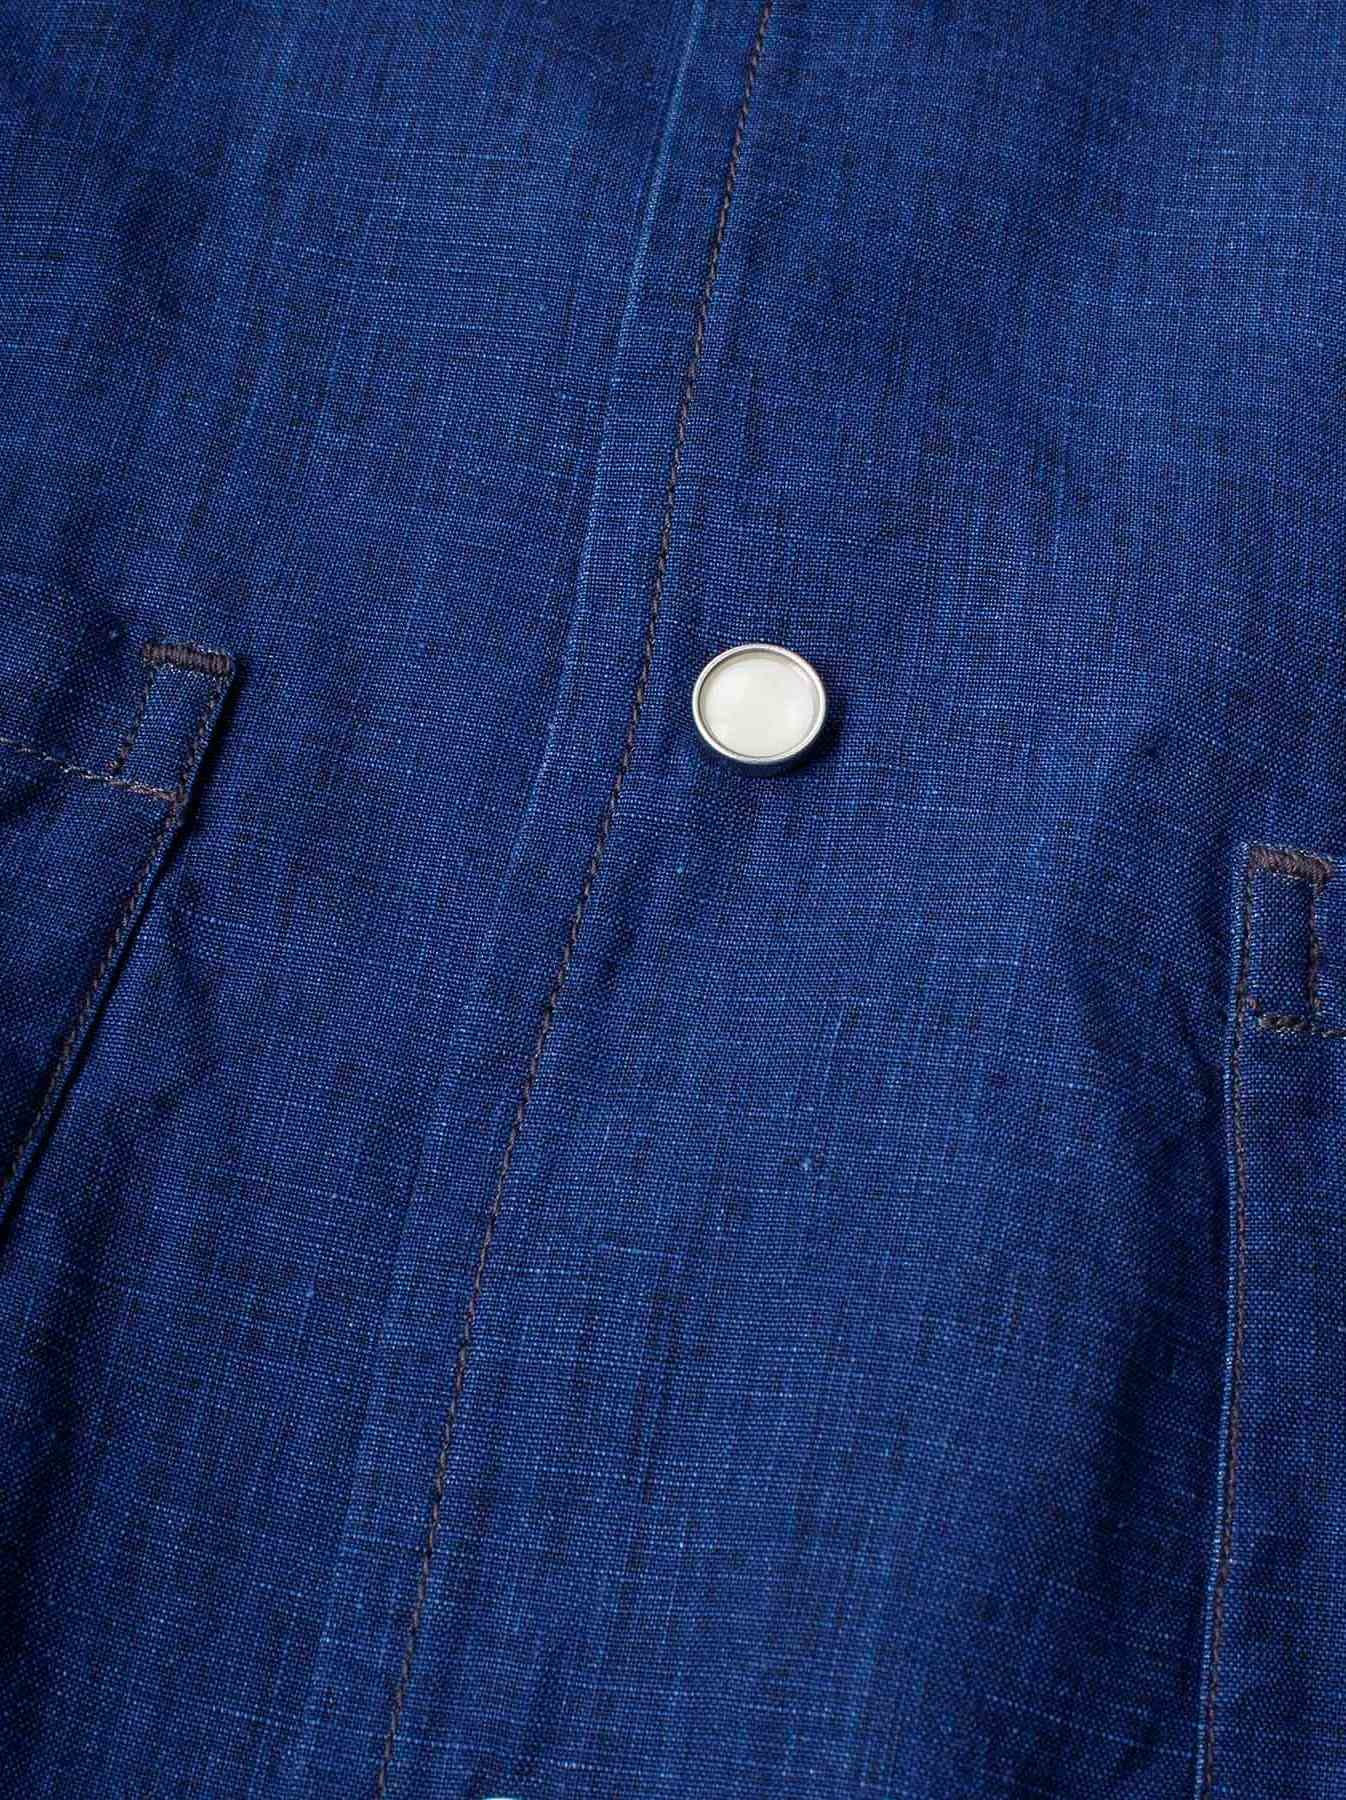 WH Indigo Linen Jean Jacket Bolero-7